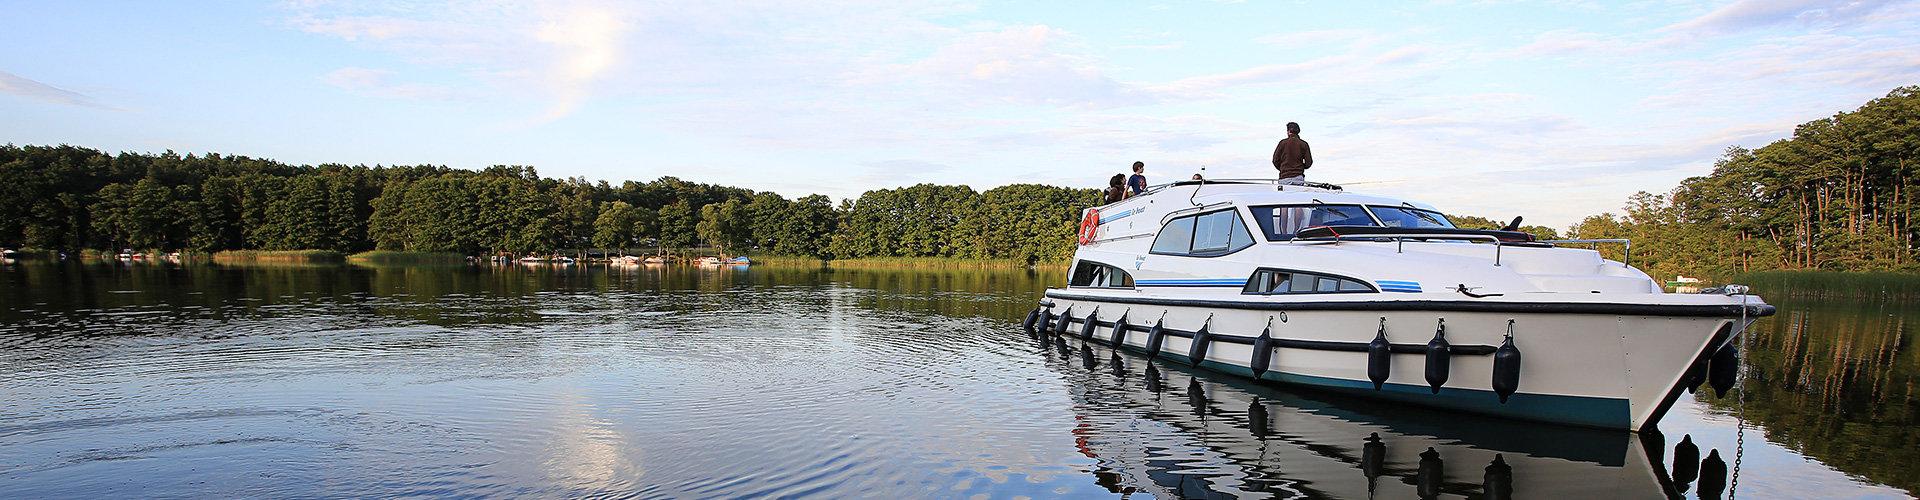 Le Boat boats